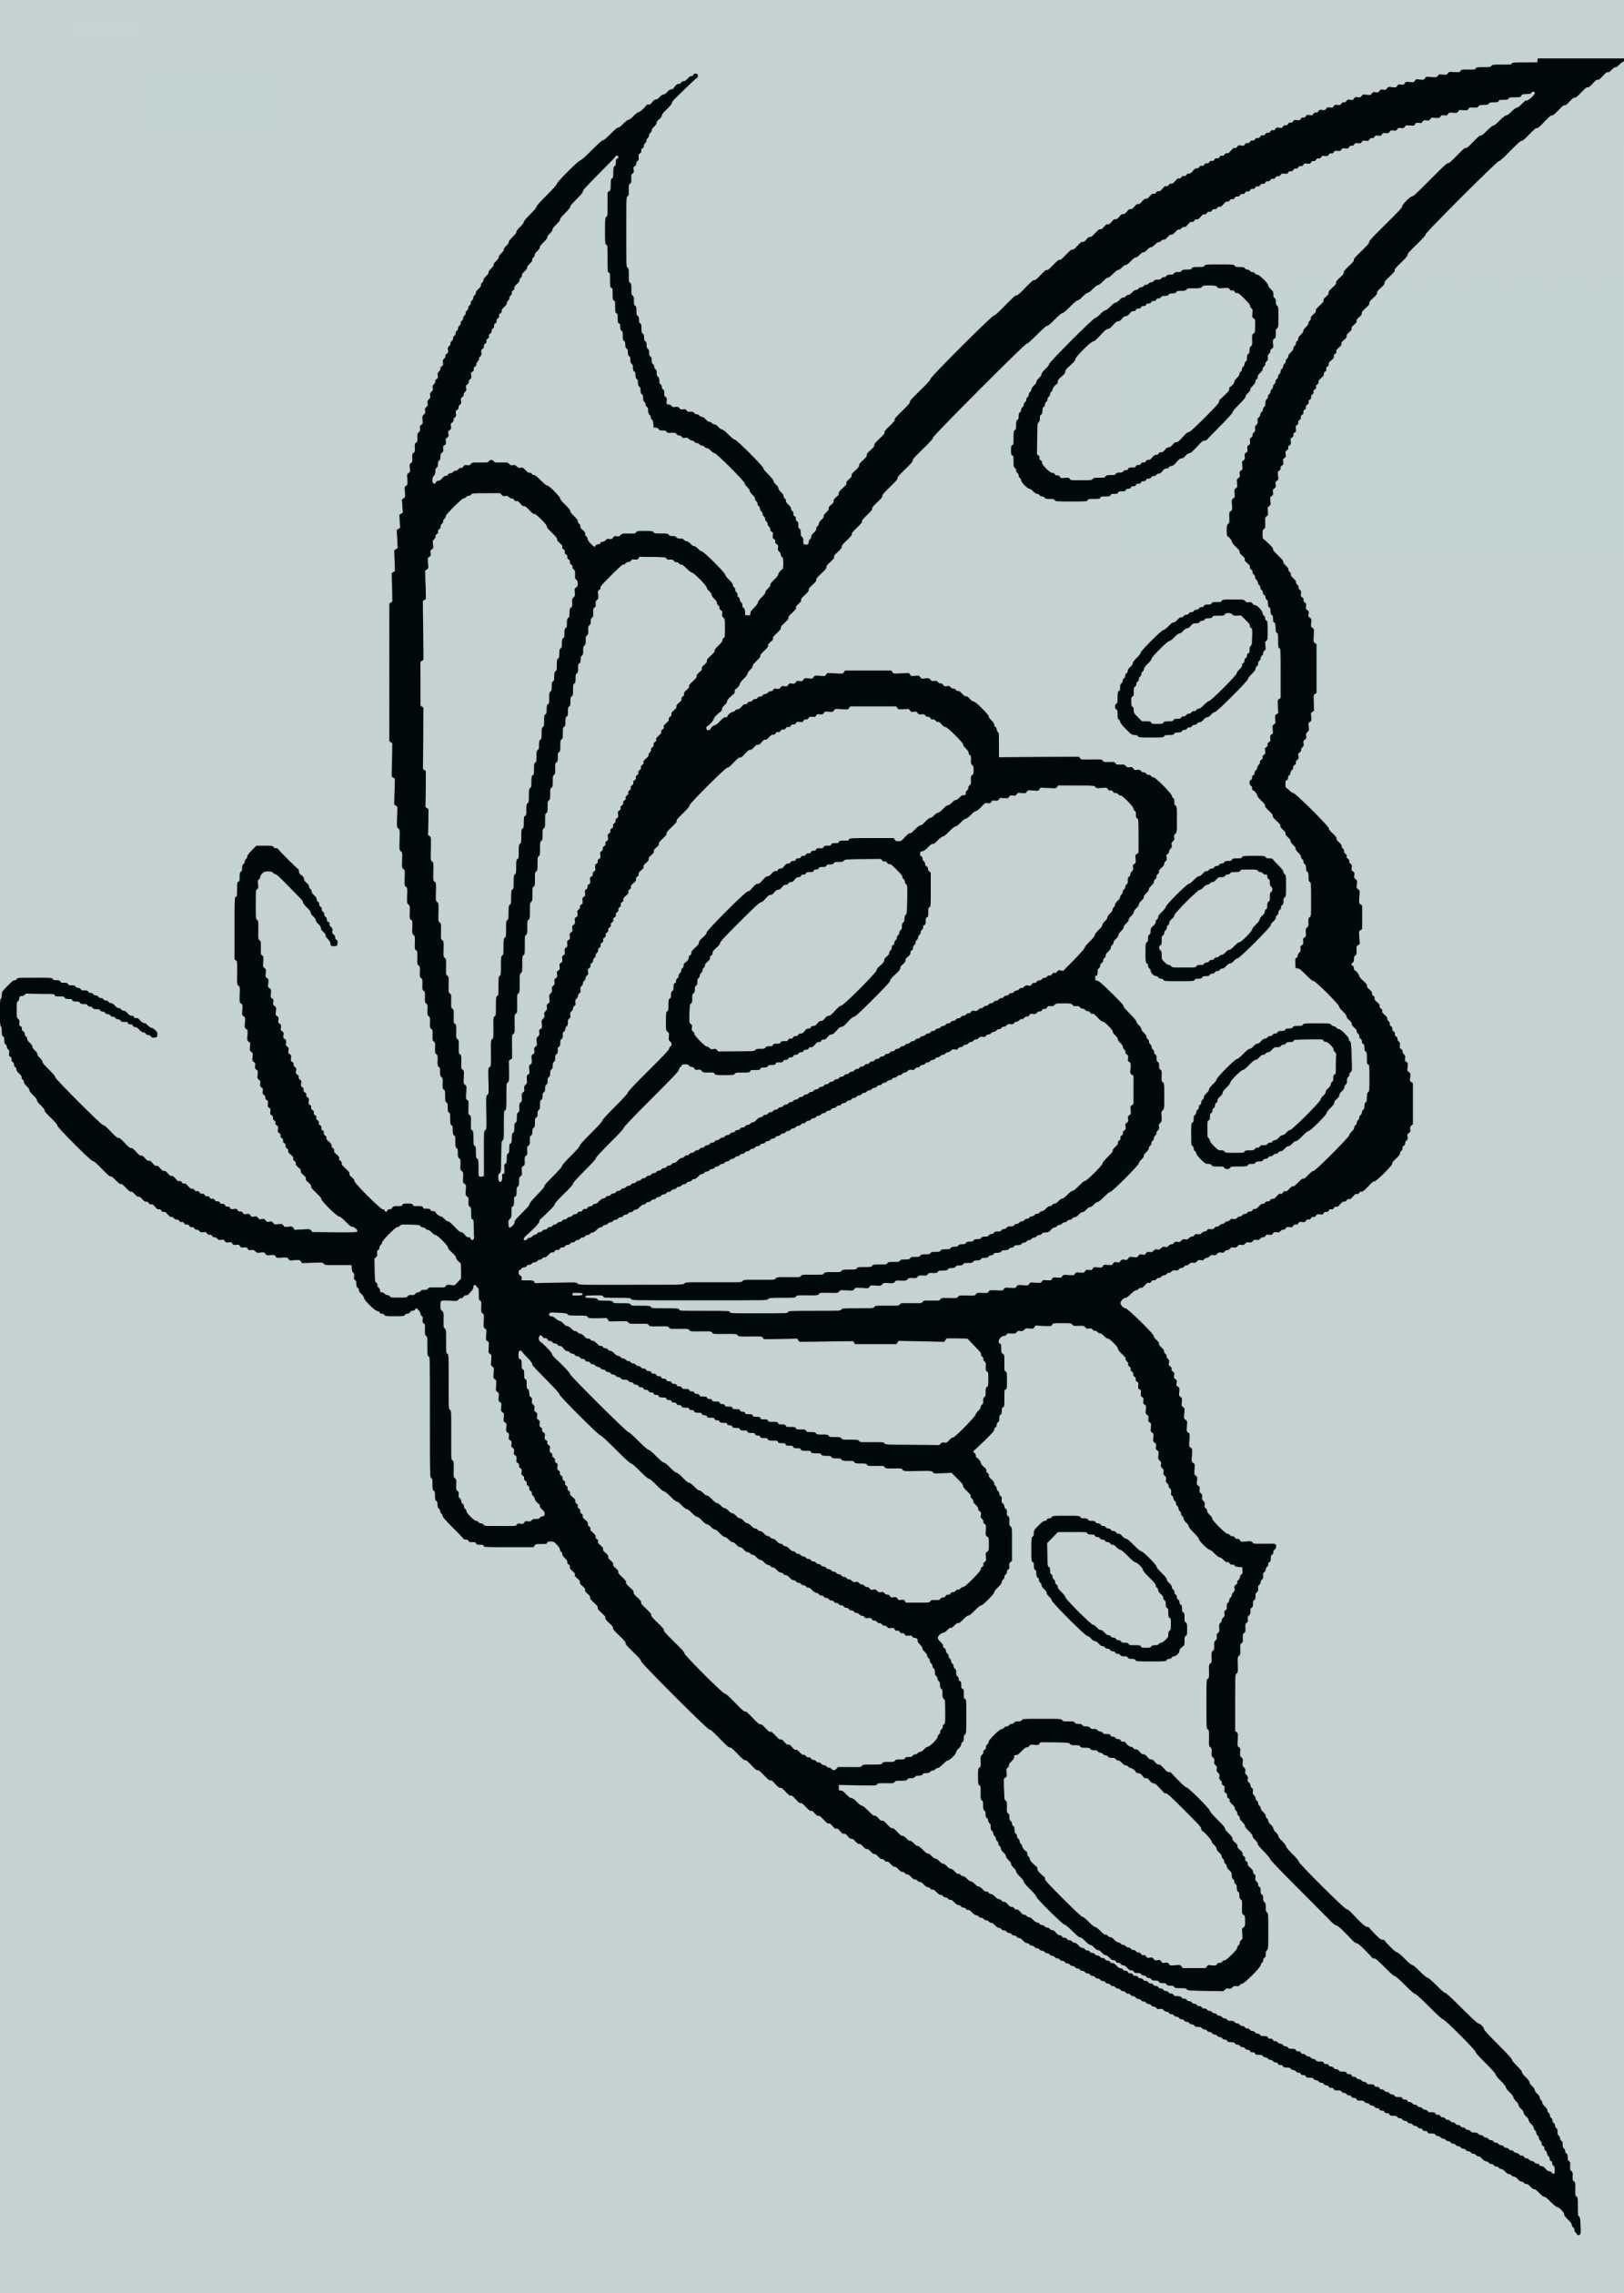 Pin By Malgorzata Samsel On Motyl Butterfly Template Butterfly Drawing Mandala Drawing